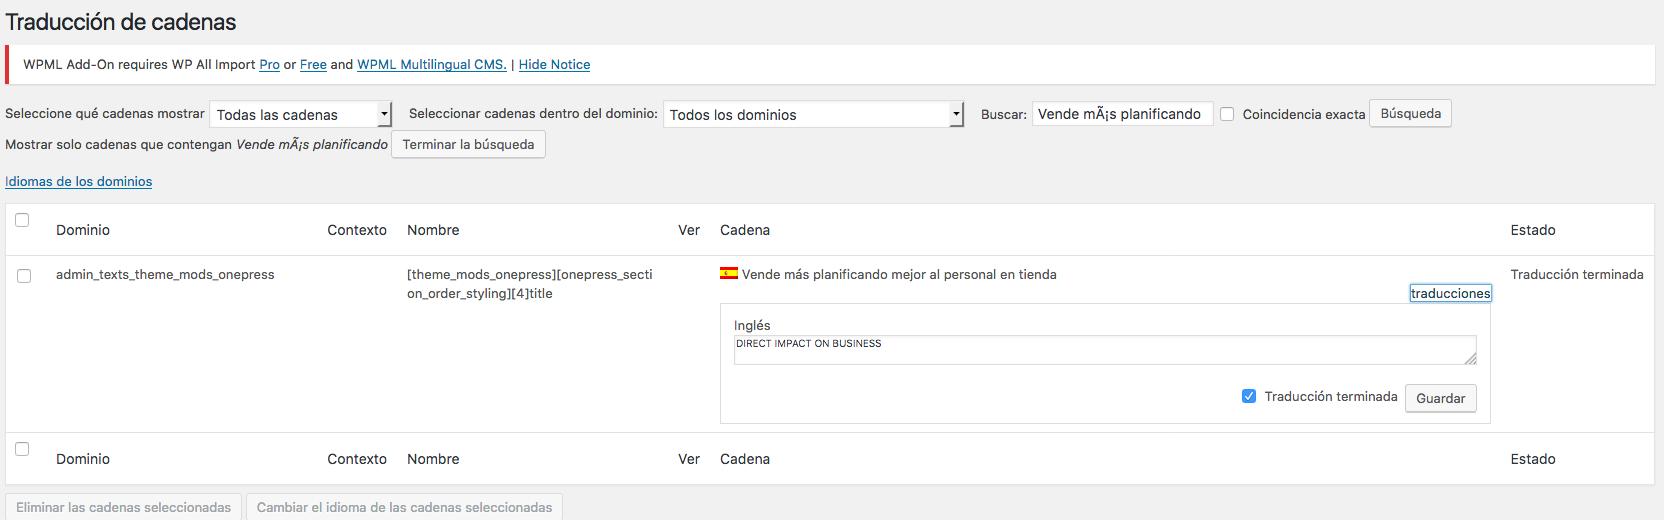 Custom Section de plantilla One Press, no se traduce - WPML